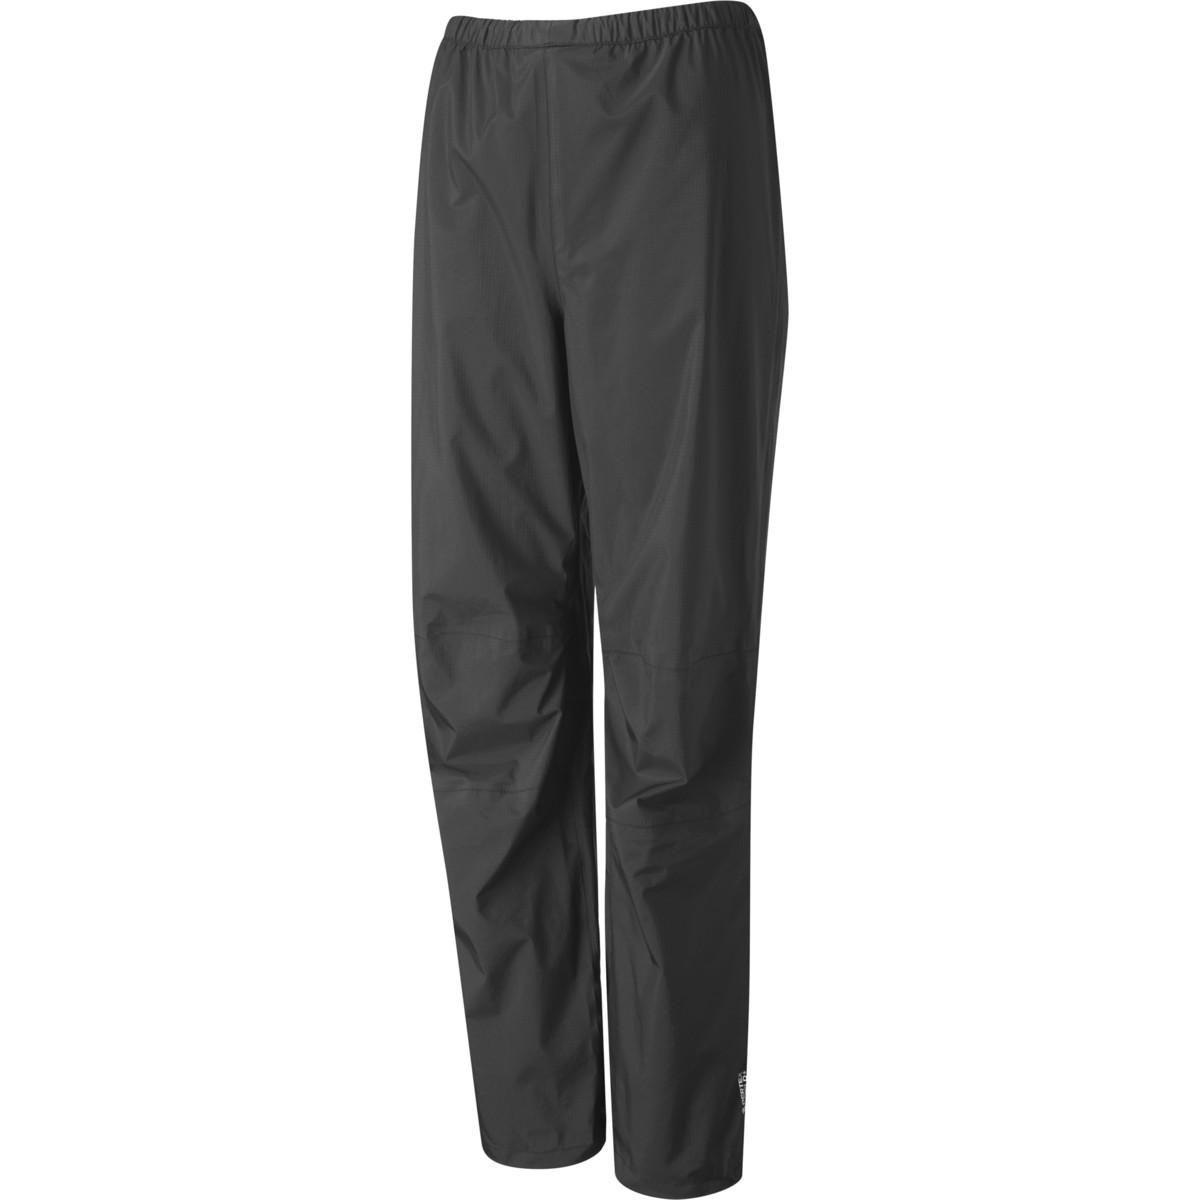 Rab Fuse Pants